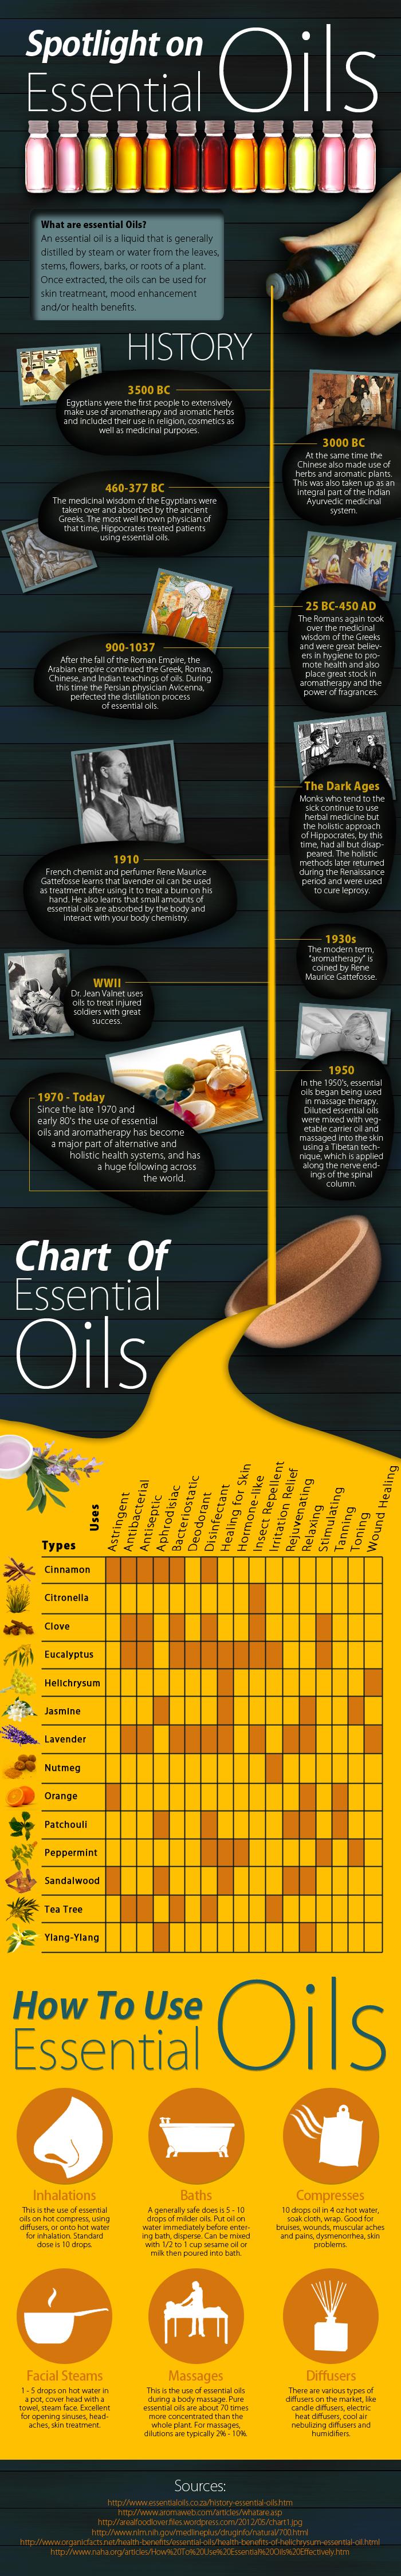 Spotlight on Essential Oils Infographic